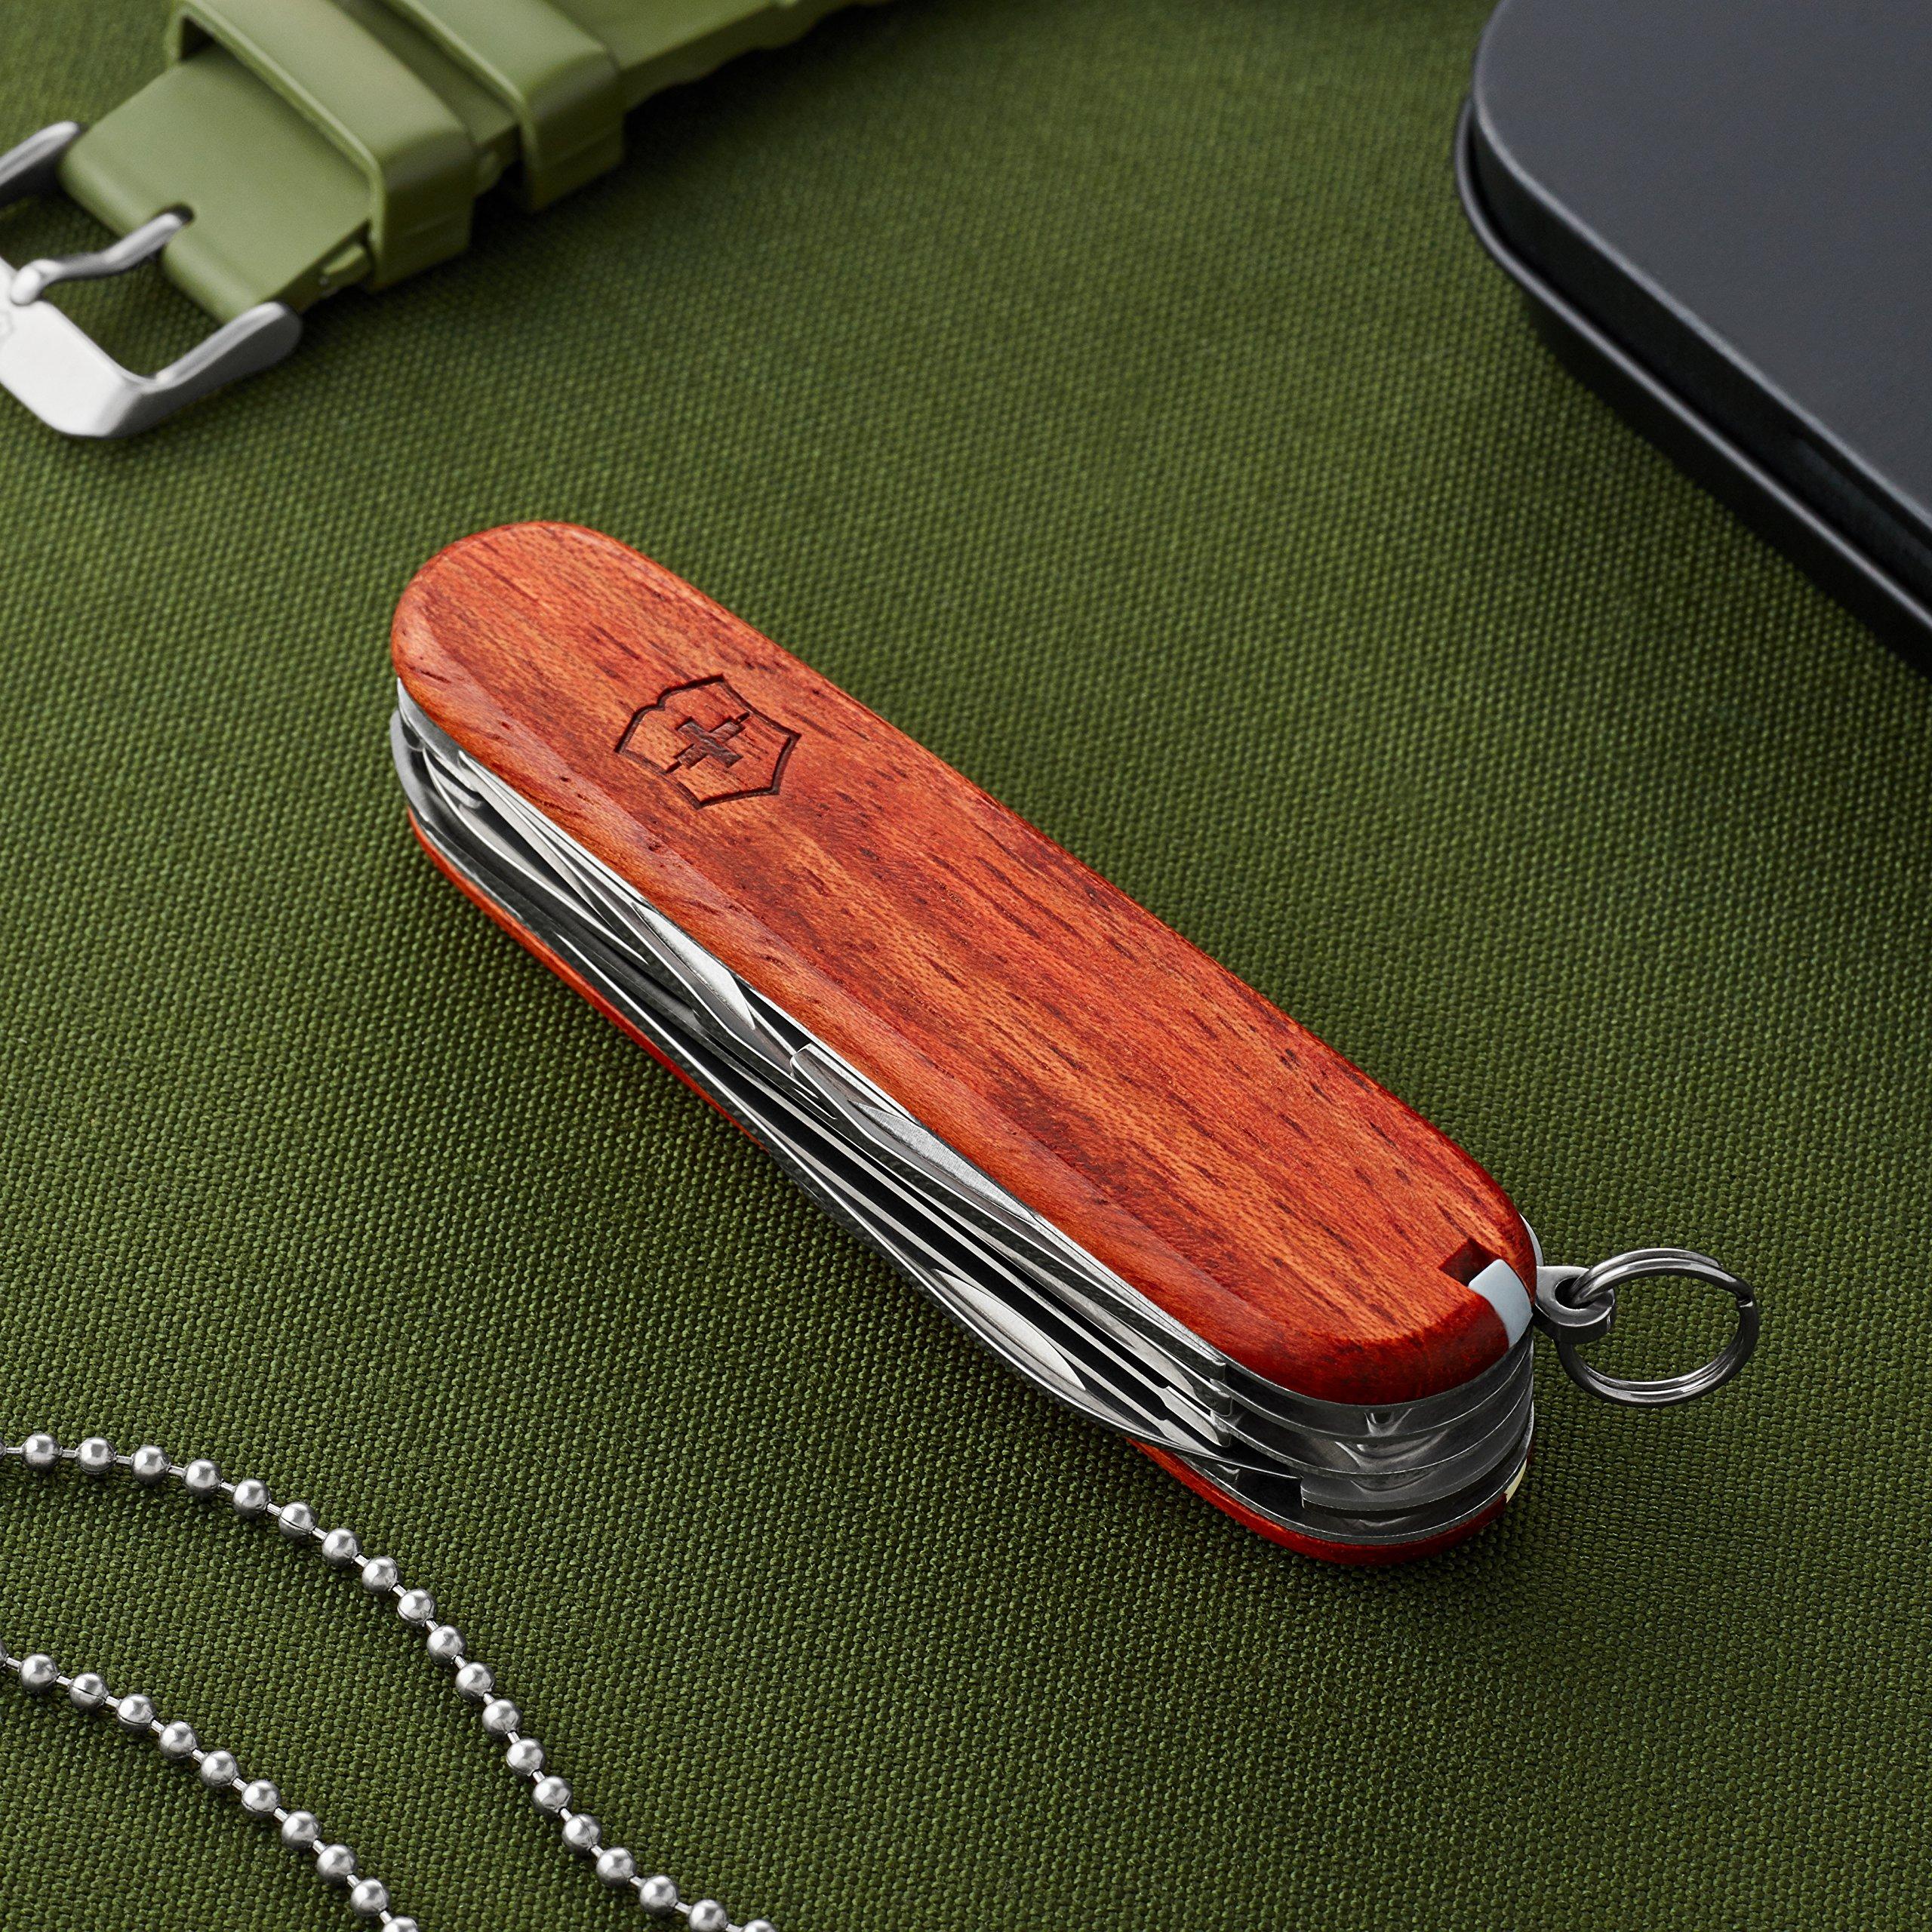 Victorinox Swiss Army Huntsman Pocket Knife, Hardwood,91mm by Victorinox (Image #2)